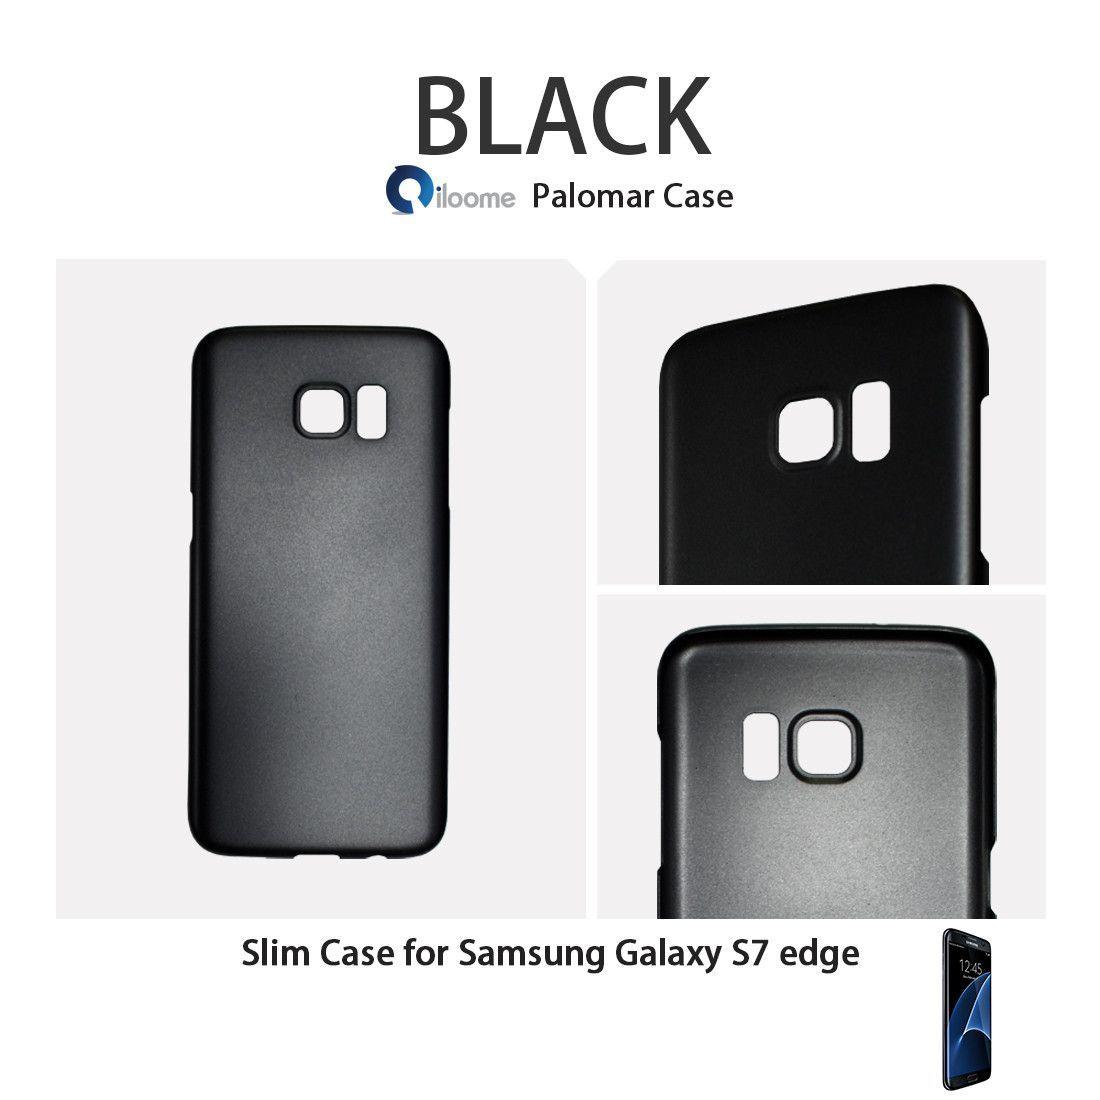 Galaxy S7 edge Palomar Case